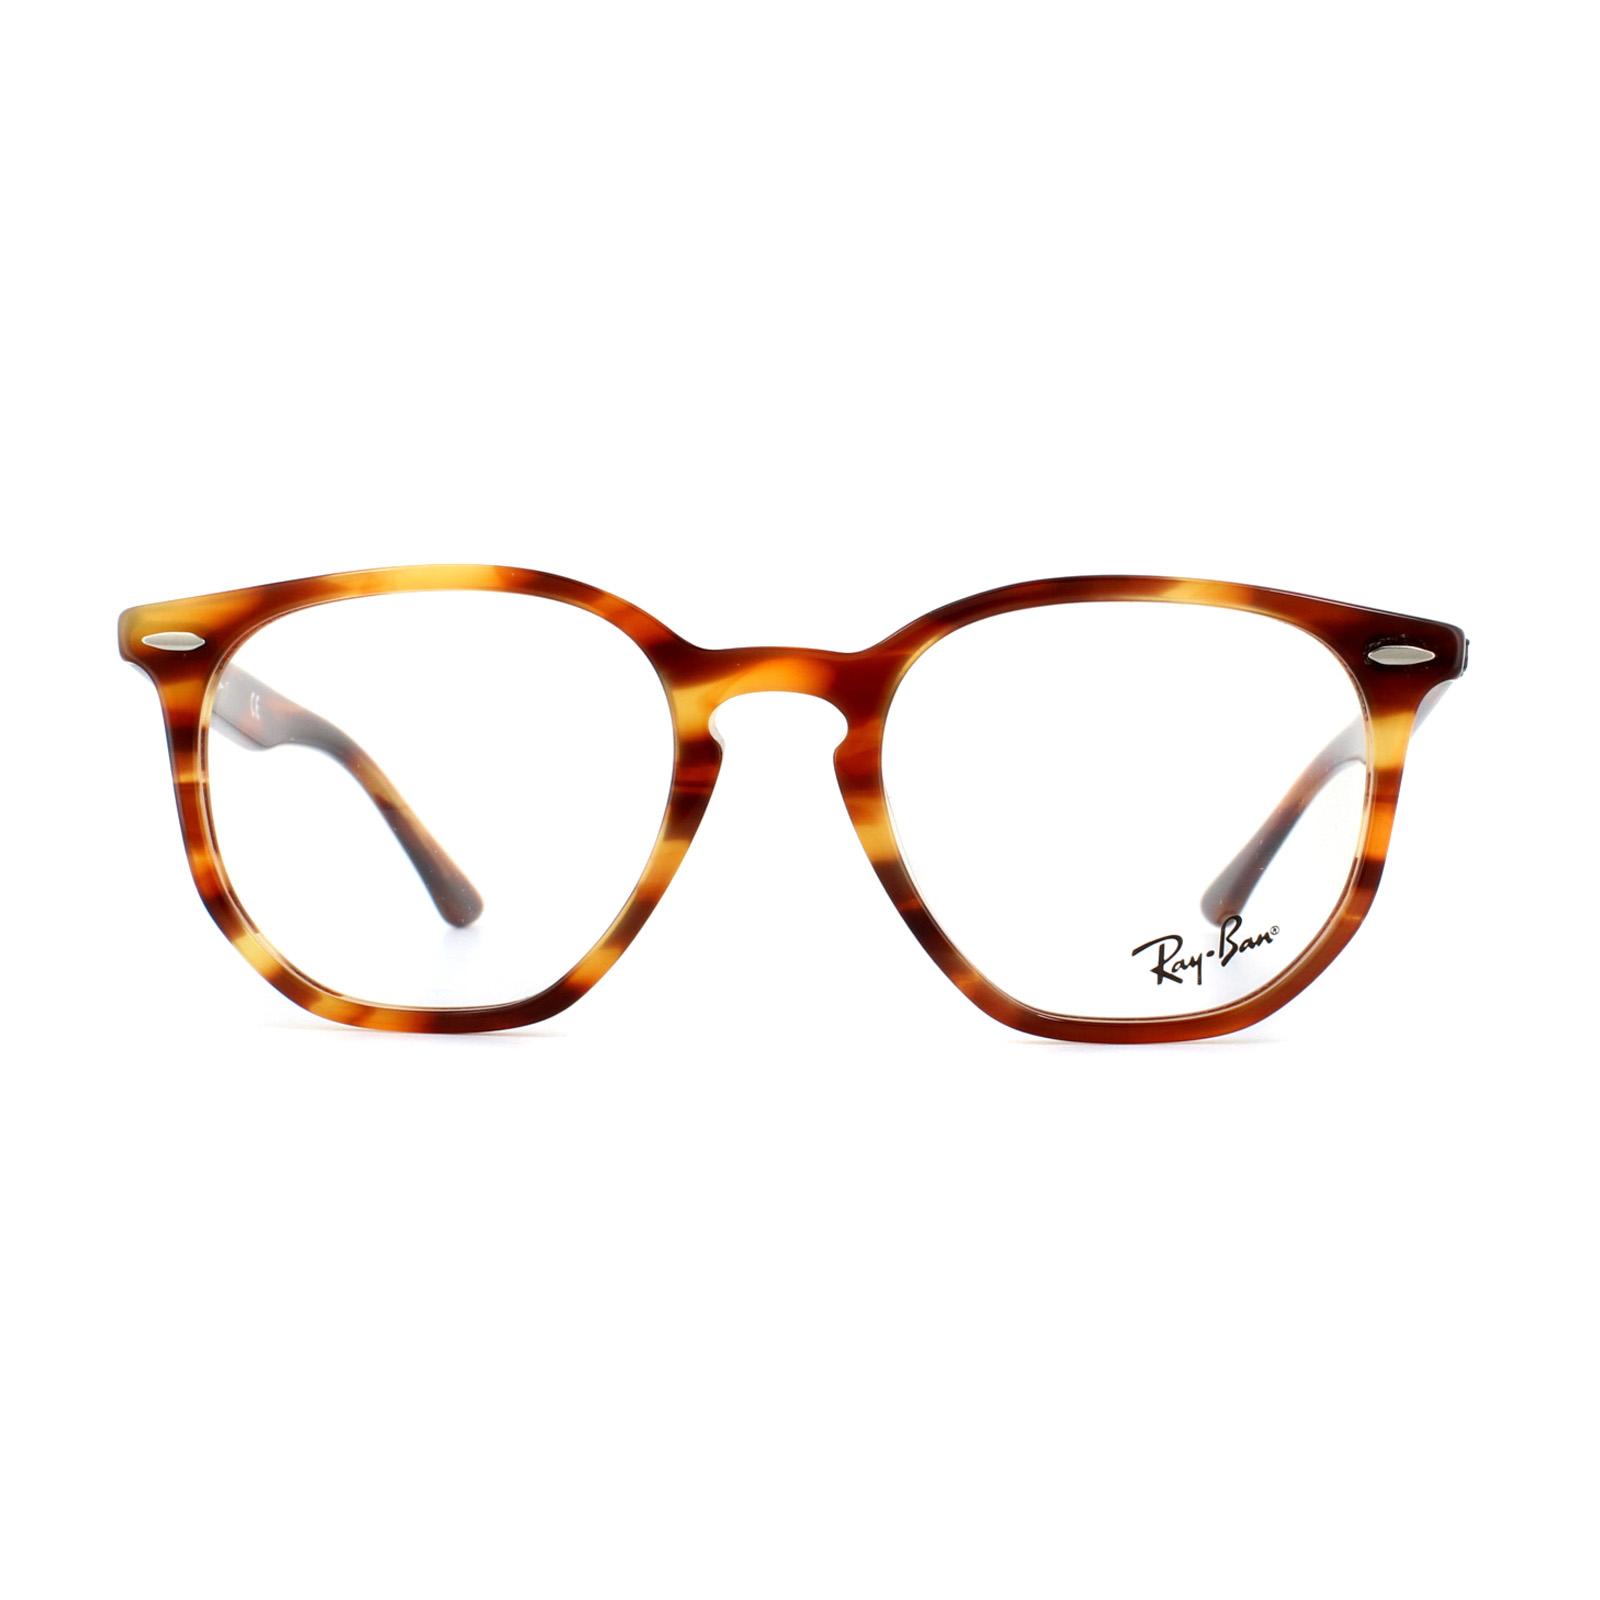 e72b43b4aa Sentinel Ray-Ban Glasses Frames 7151 Hexagonal 5797 Havana Red Brown 50mm